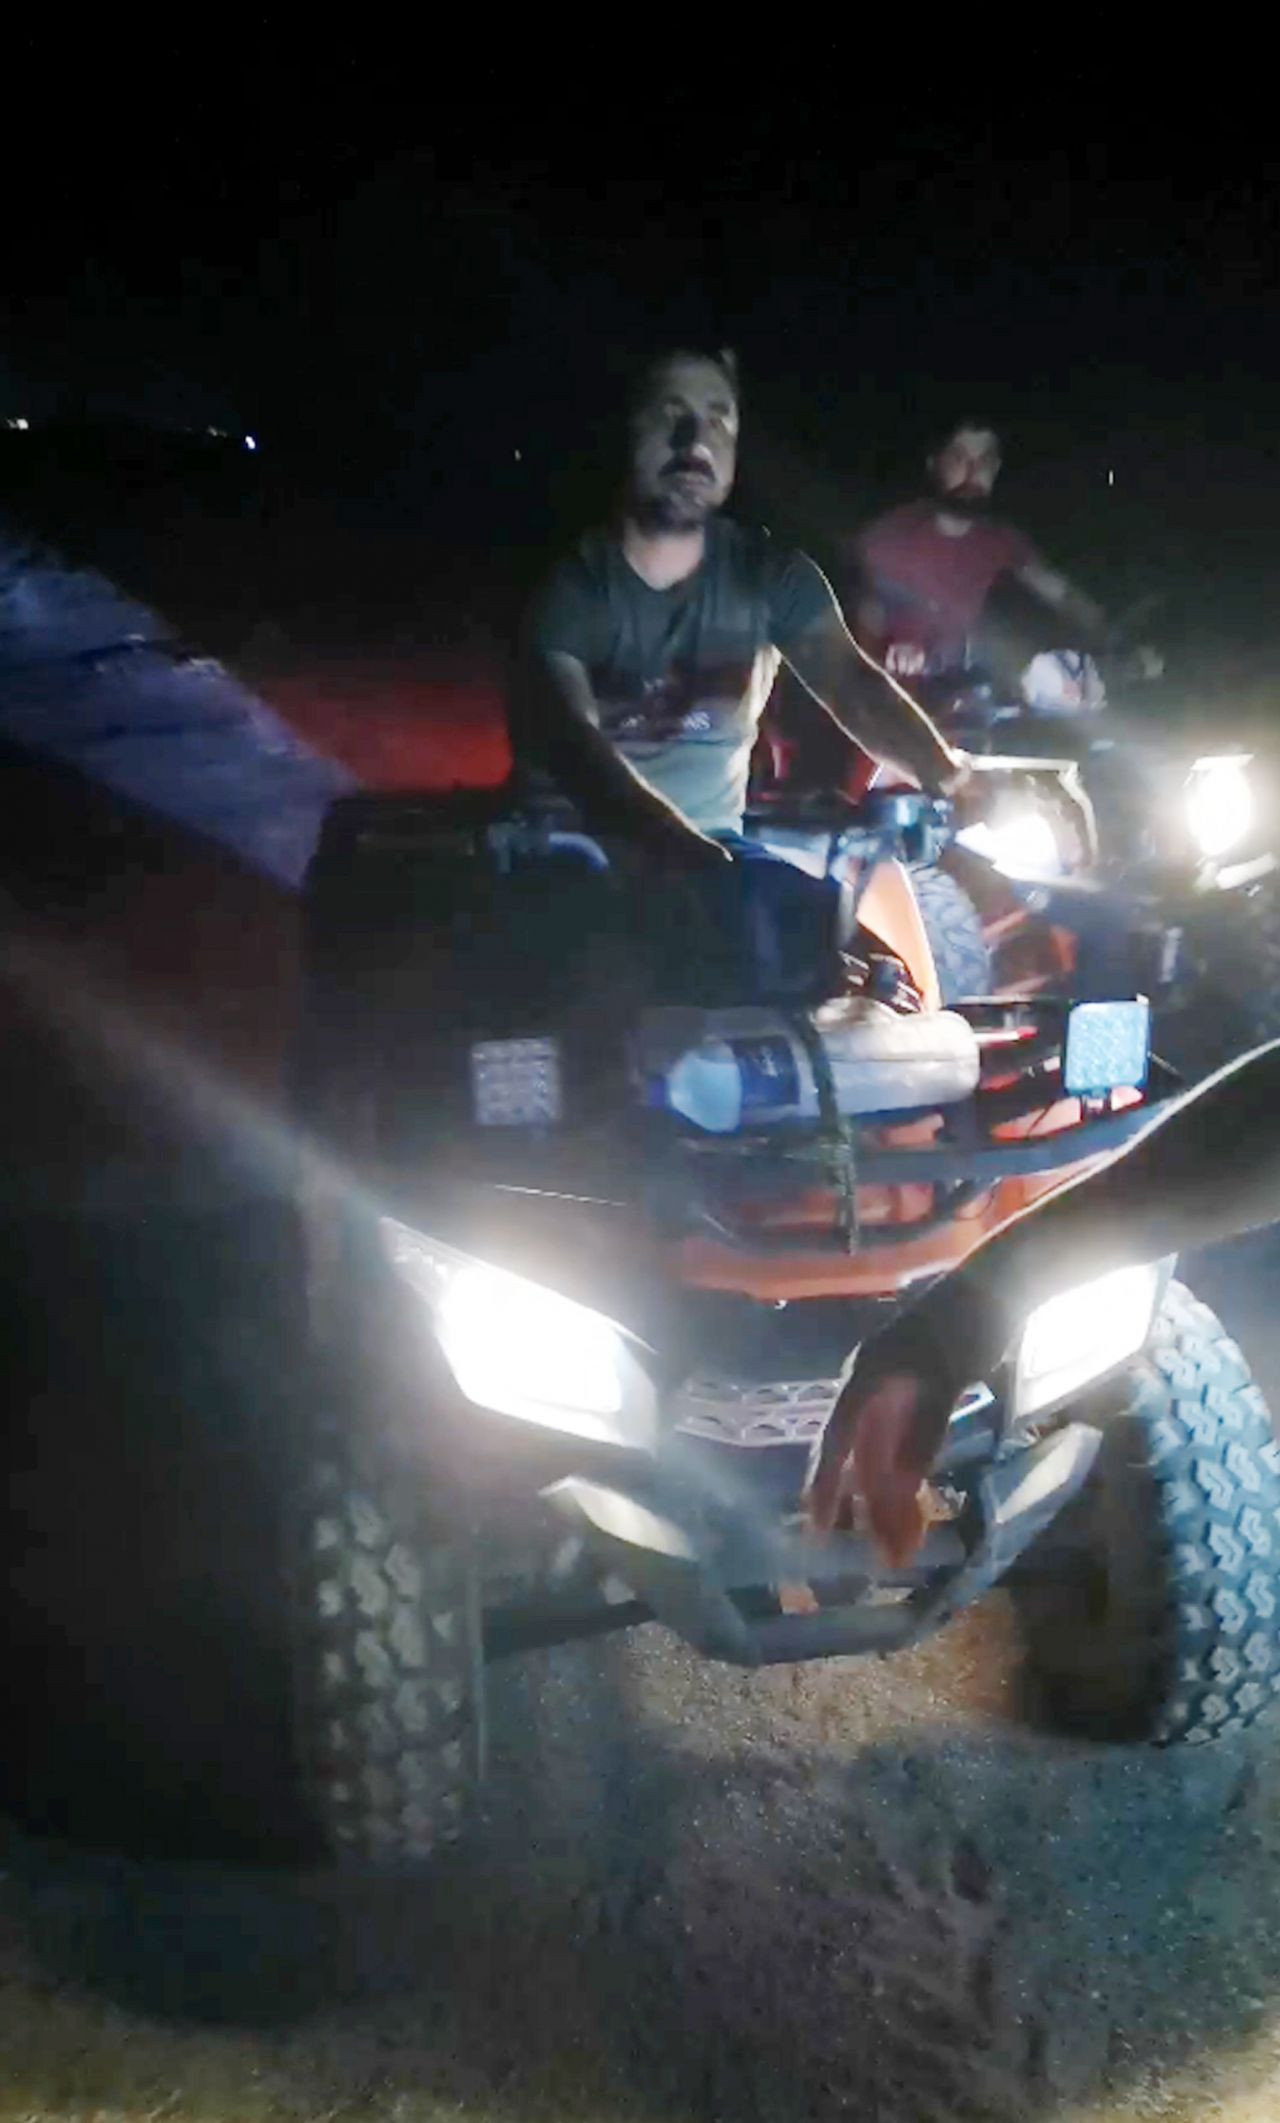 Two men on ATVs kill caretta caretta babies on Antalya beach - Page 4